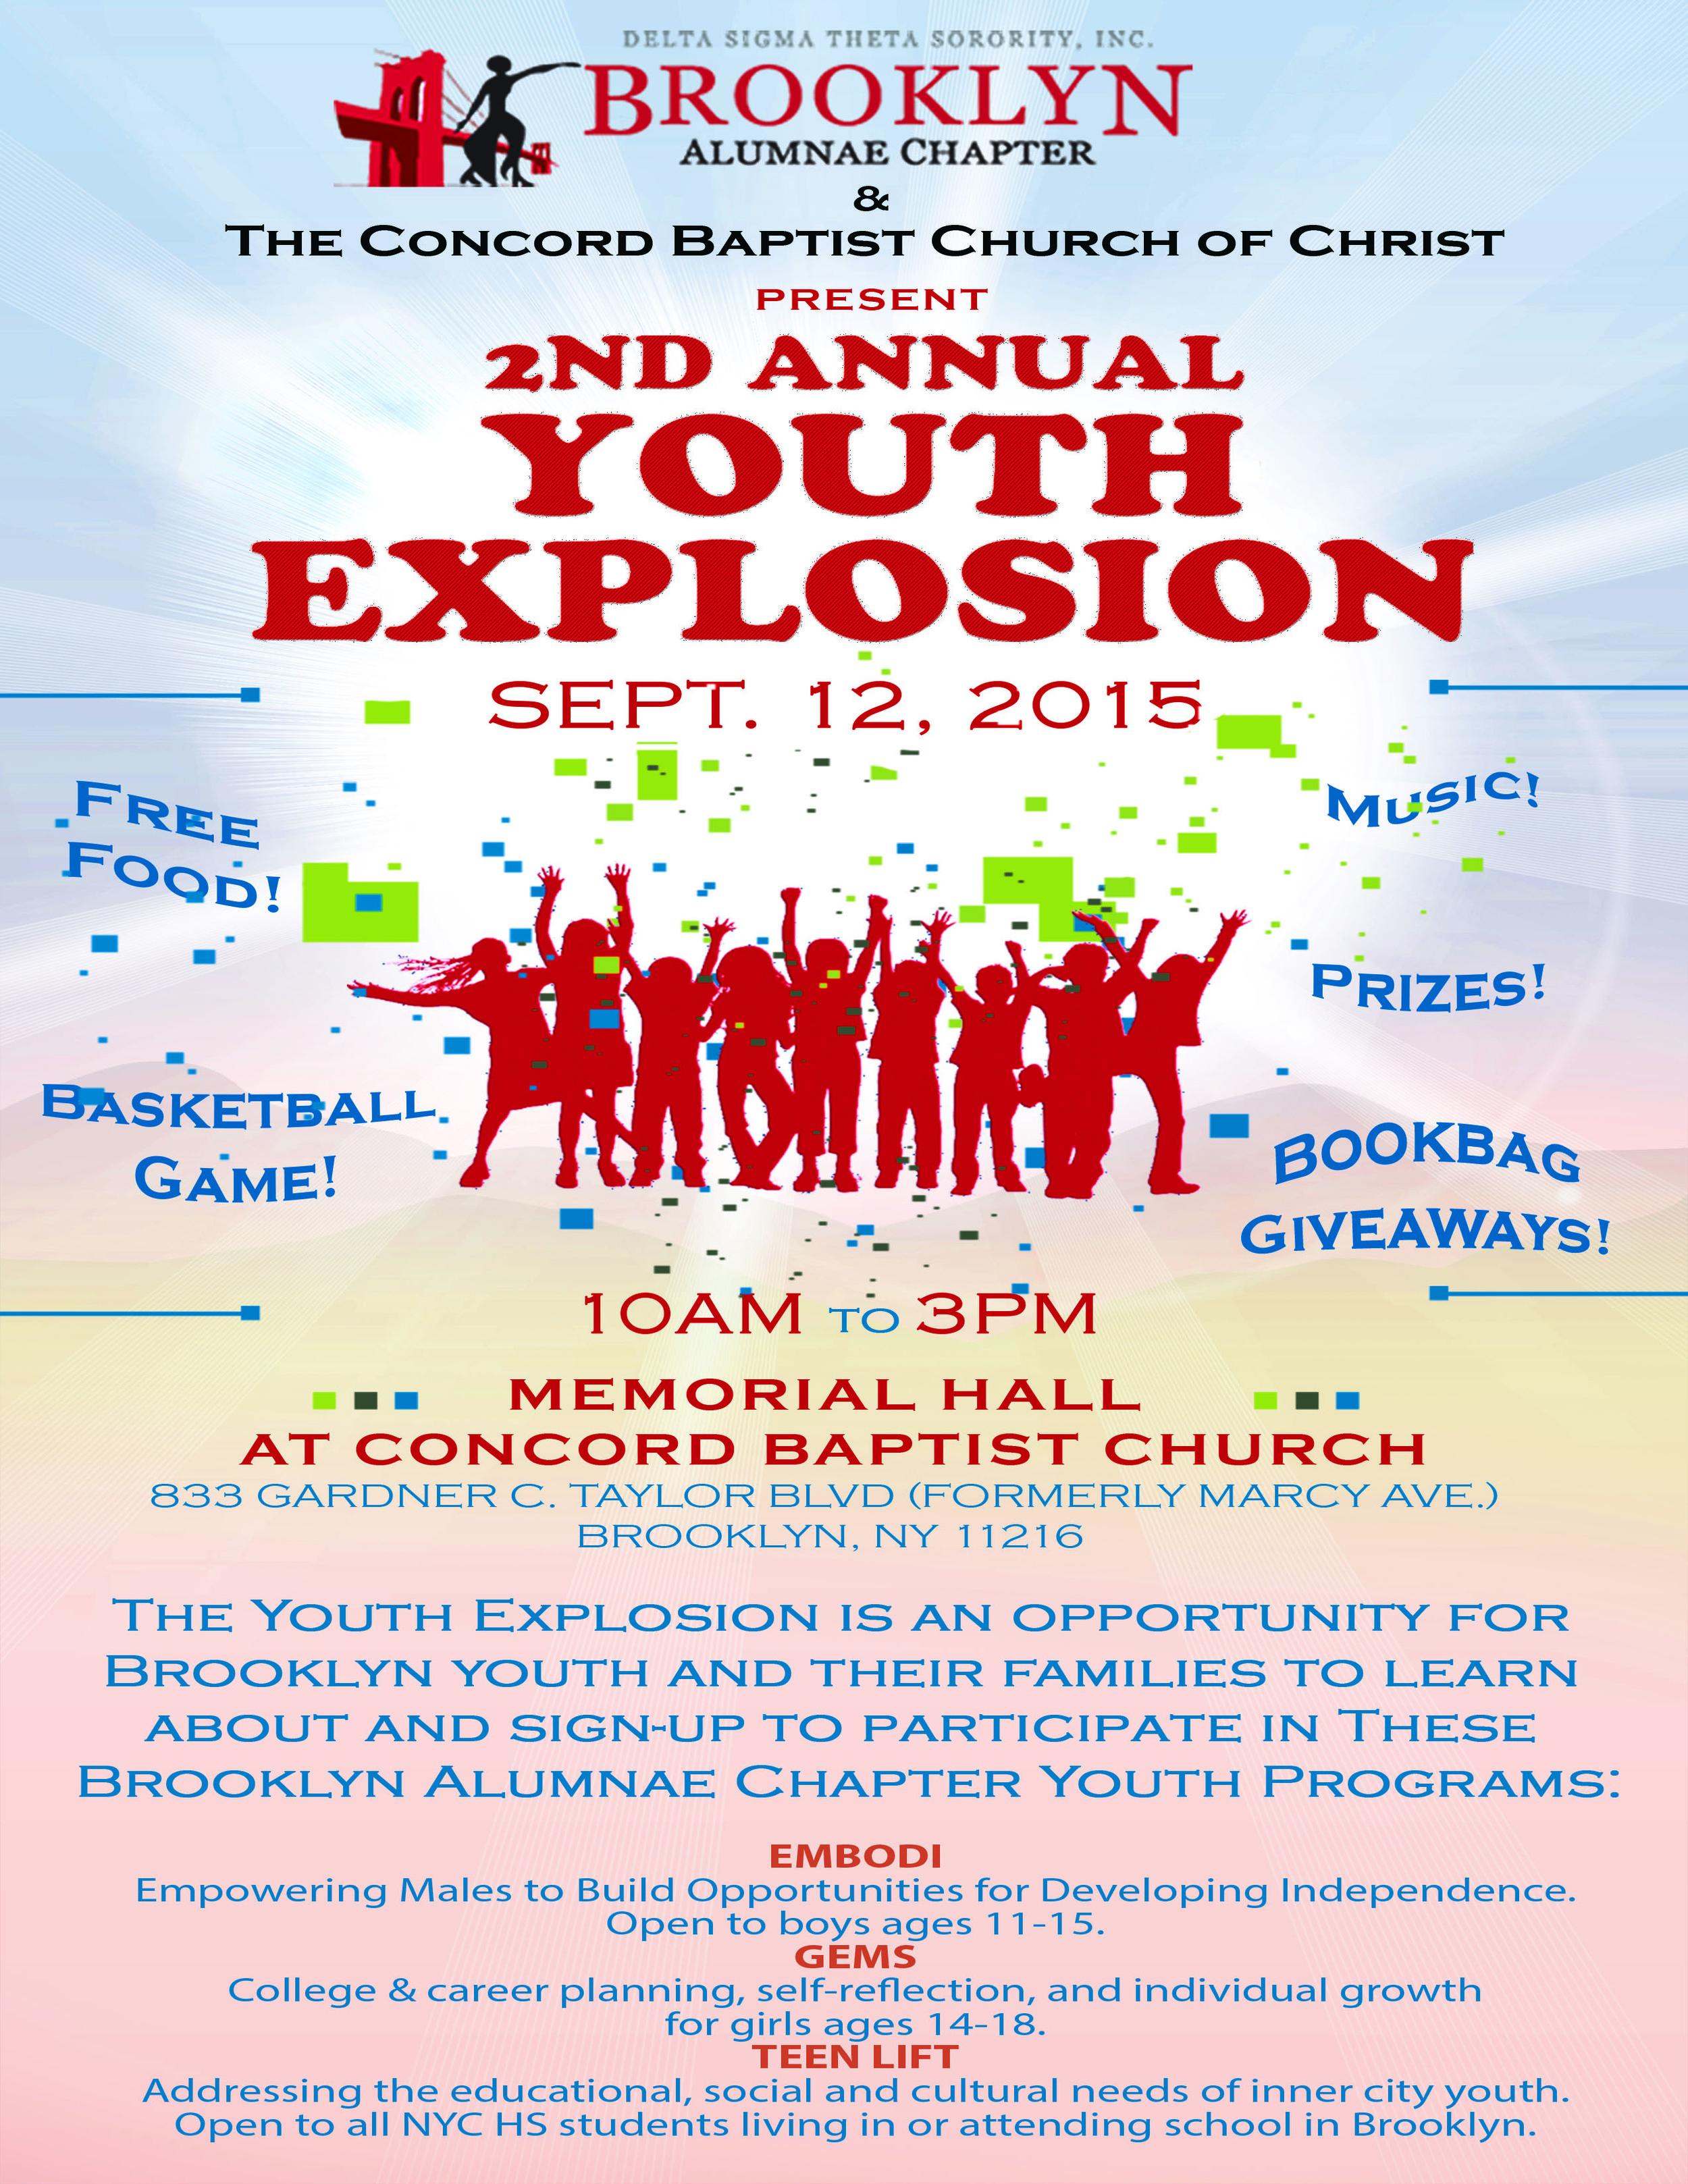 YouthExplosion_2.1.jpg